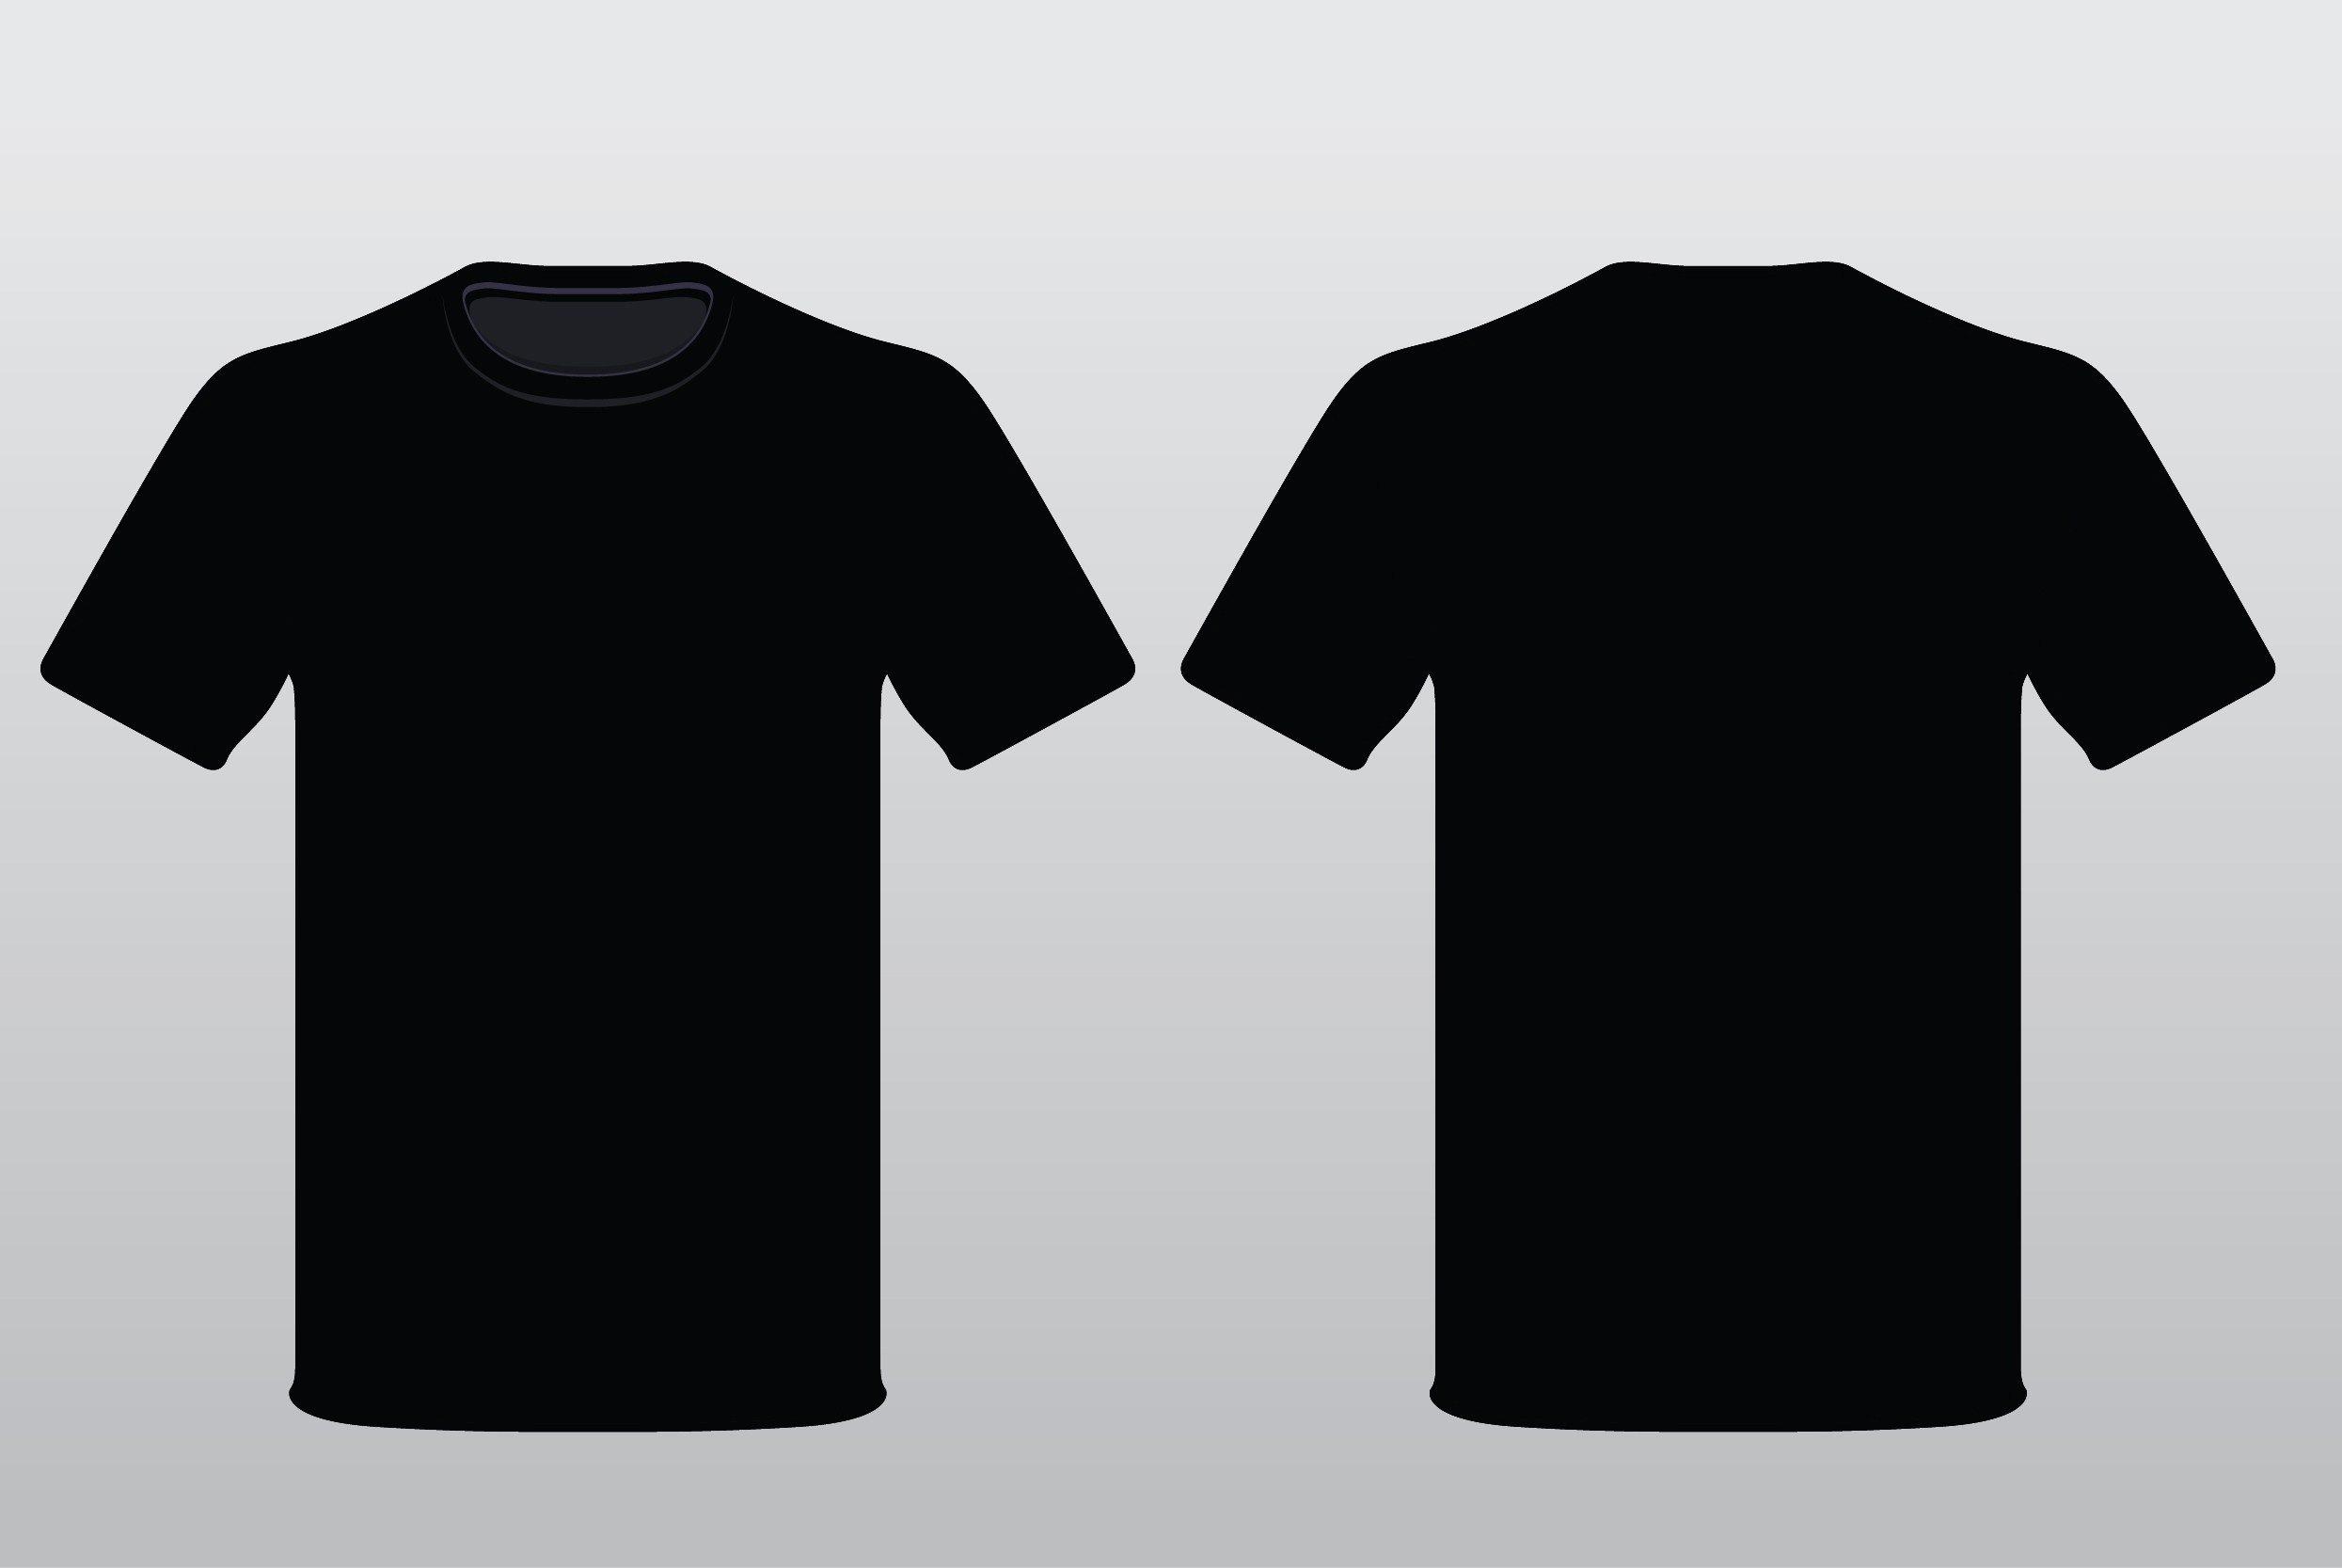 Tee Shirt Design Template All Over Print T Shirt Design Templates